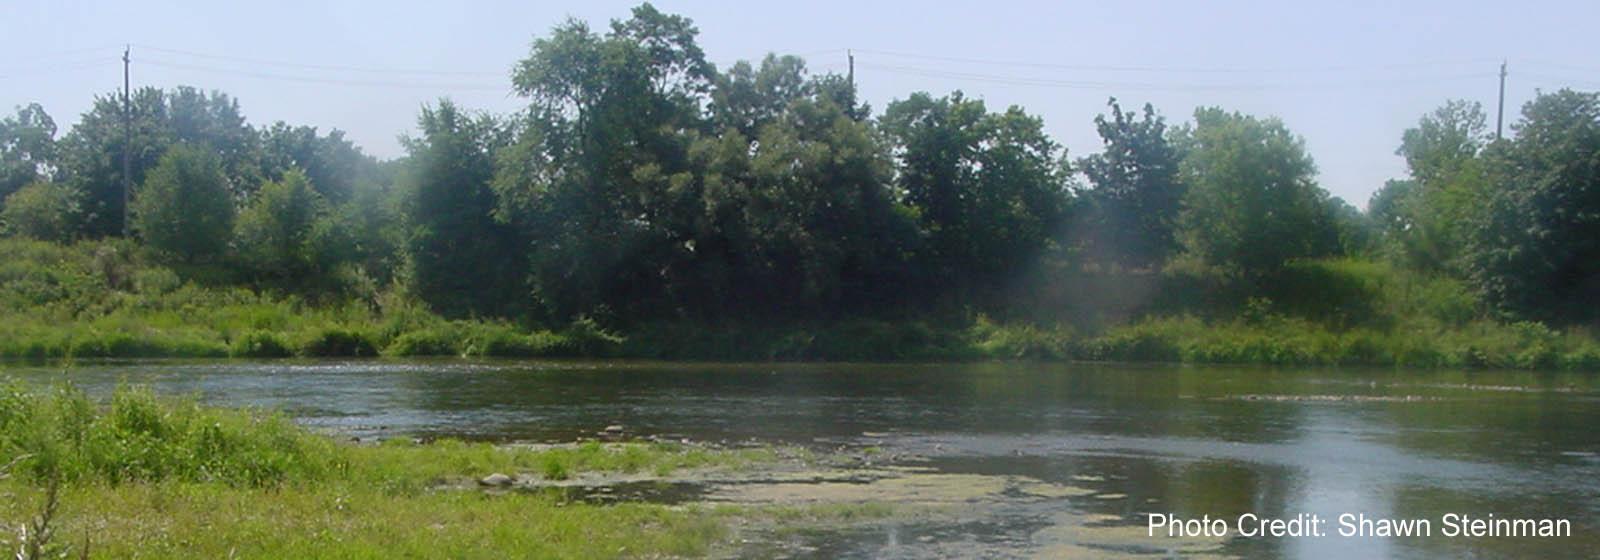 Kitchener-lakes in the park- sliver (Shawn Steinman)